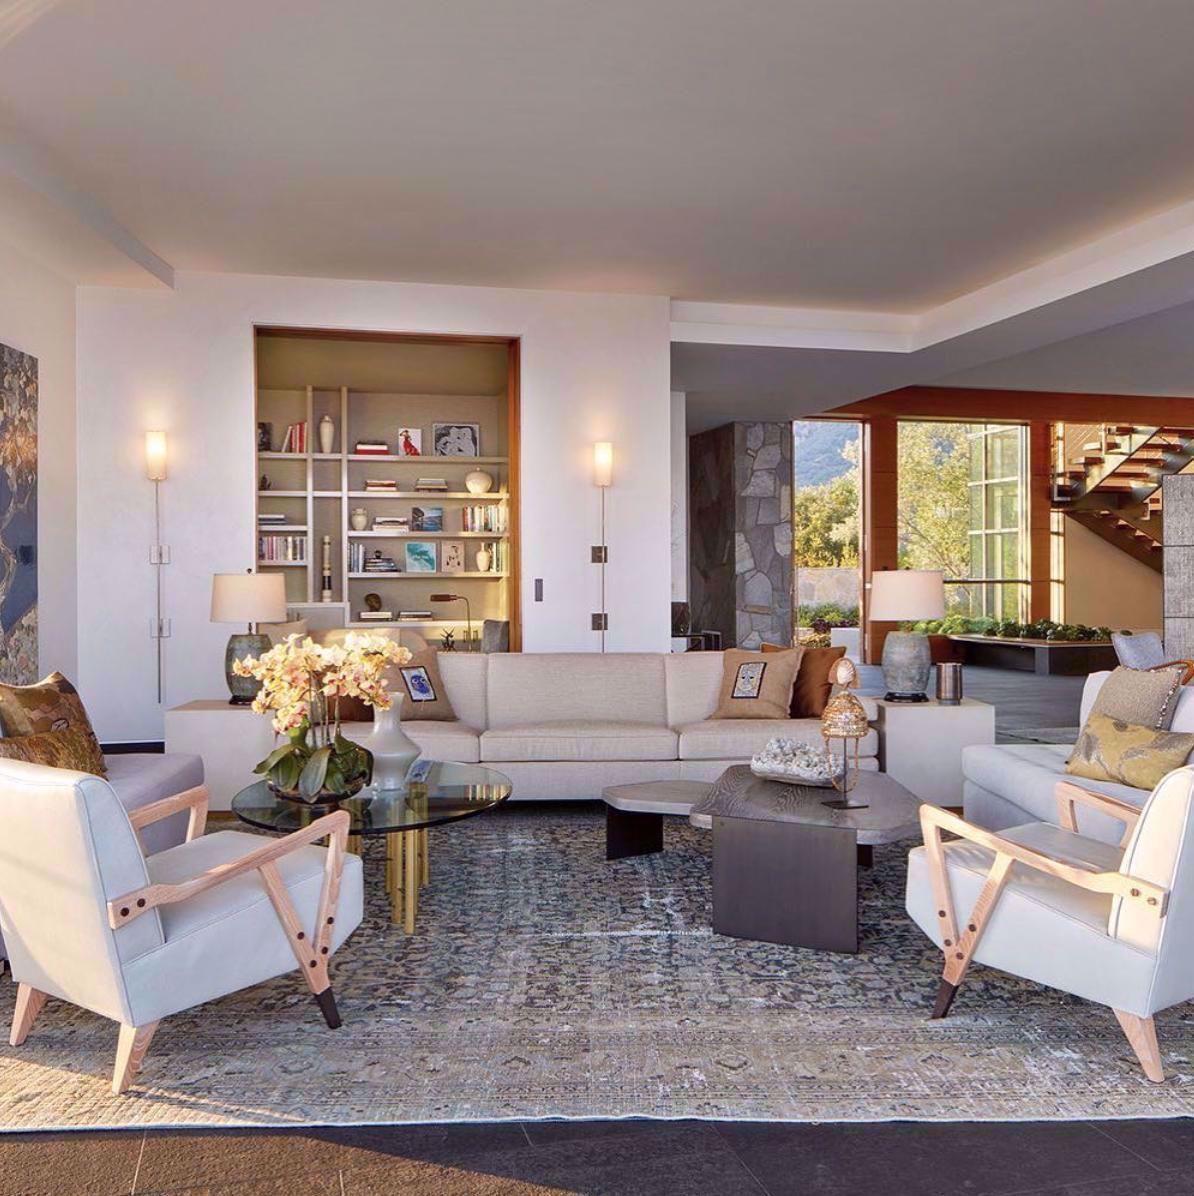 The best example of California living. Bright, airy, and connected to nature. #malibu #bradleybayou #bradleybayouhome #designer #california #californiahomes #markphillips #interiordesign #home #designinspo #livingroom #bookshelf #sofa #interiordesigner #beach #lifestyle #homestyle #style #beauty